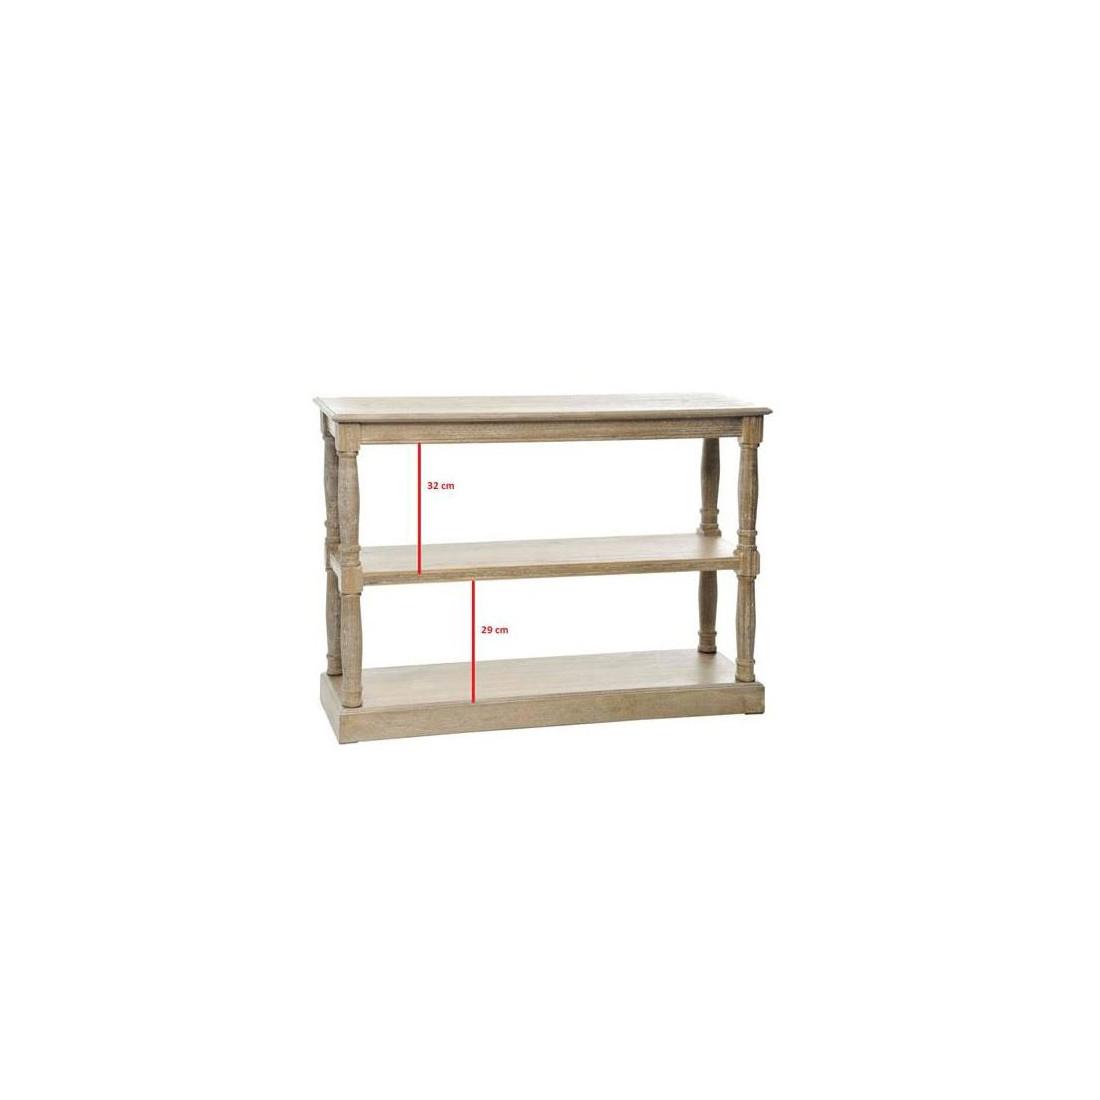 console 3 tag res grise eve univers petits meubles tousmesmeubles. Black Bedroom Furniture Sets. Home Design Ideas